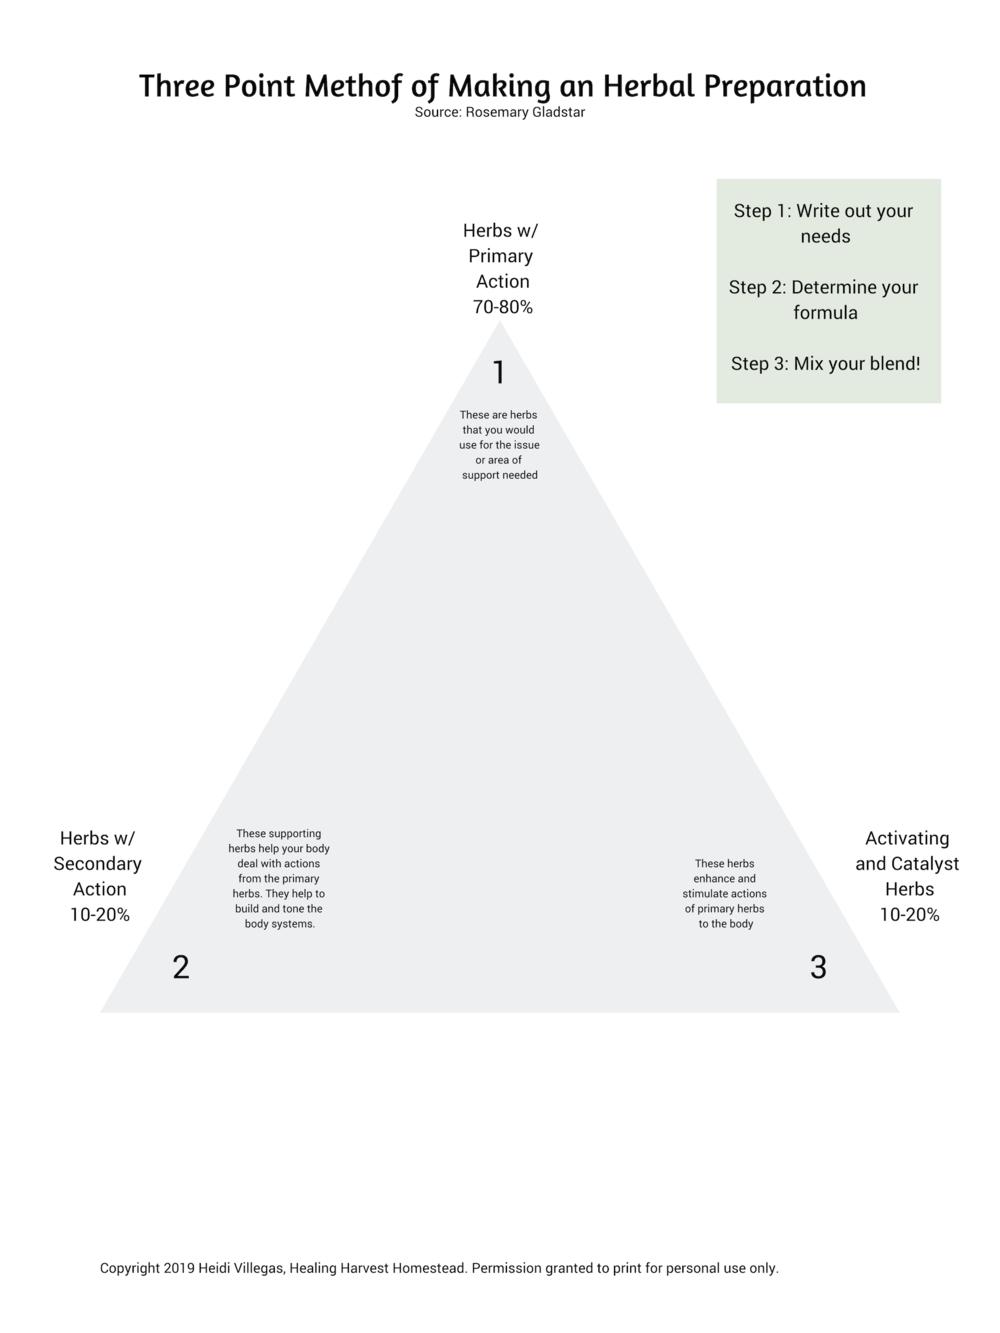 PDF Herbal Medicine Formulating Triangle.png